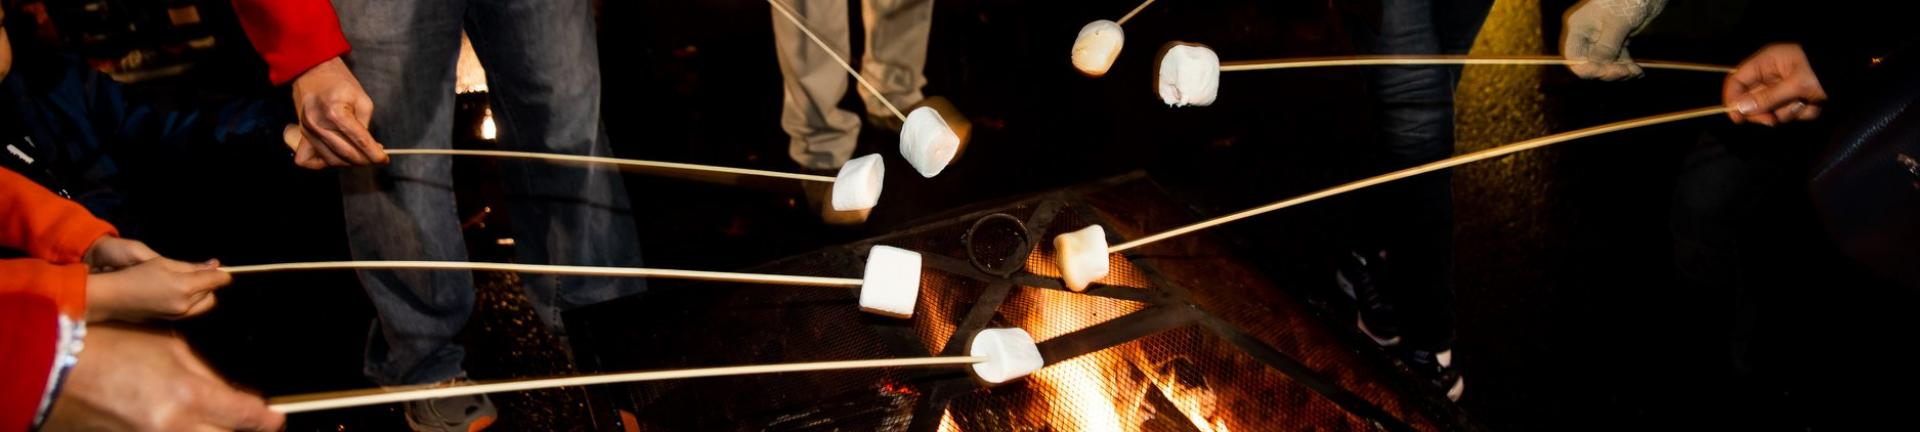 Marshmallow Roasting at Downtown Christmas Magic, True Light Photography